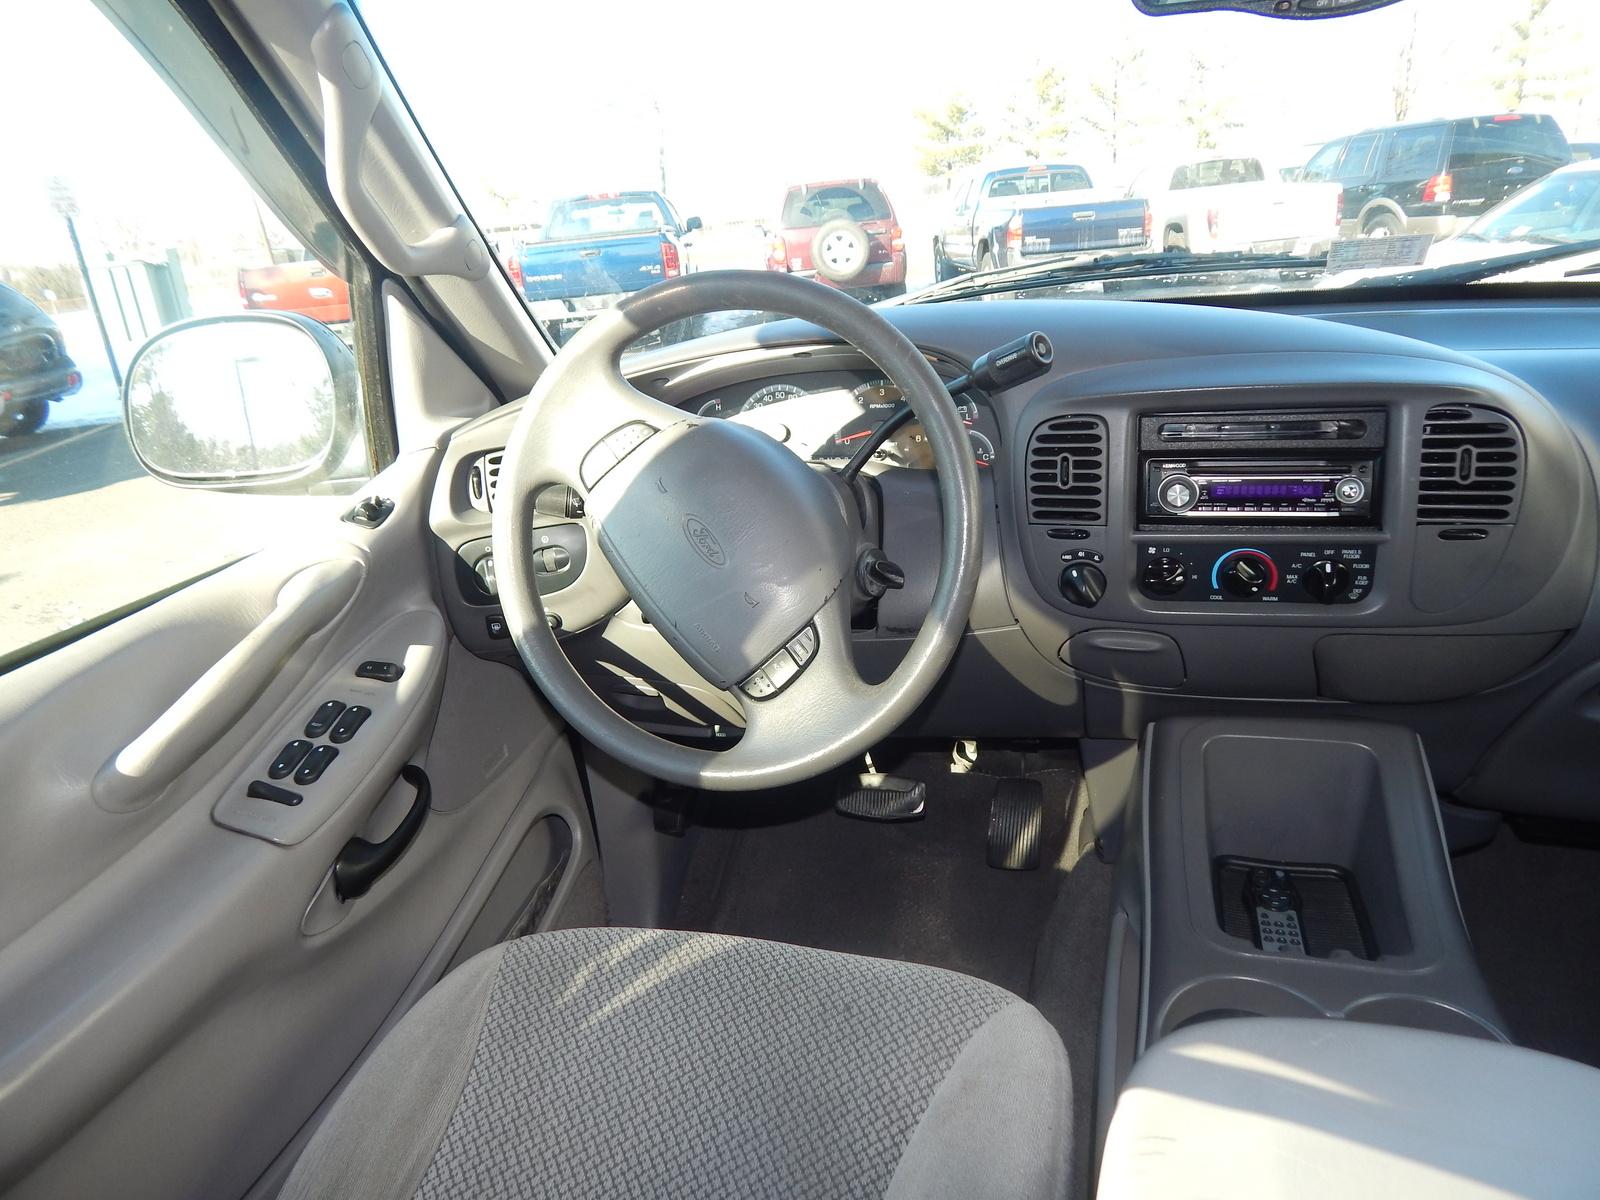 2002 Ford Expedition Interior Pictures Cargurus